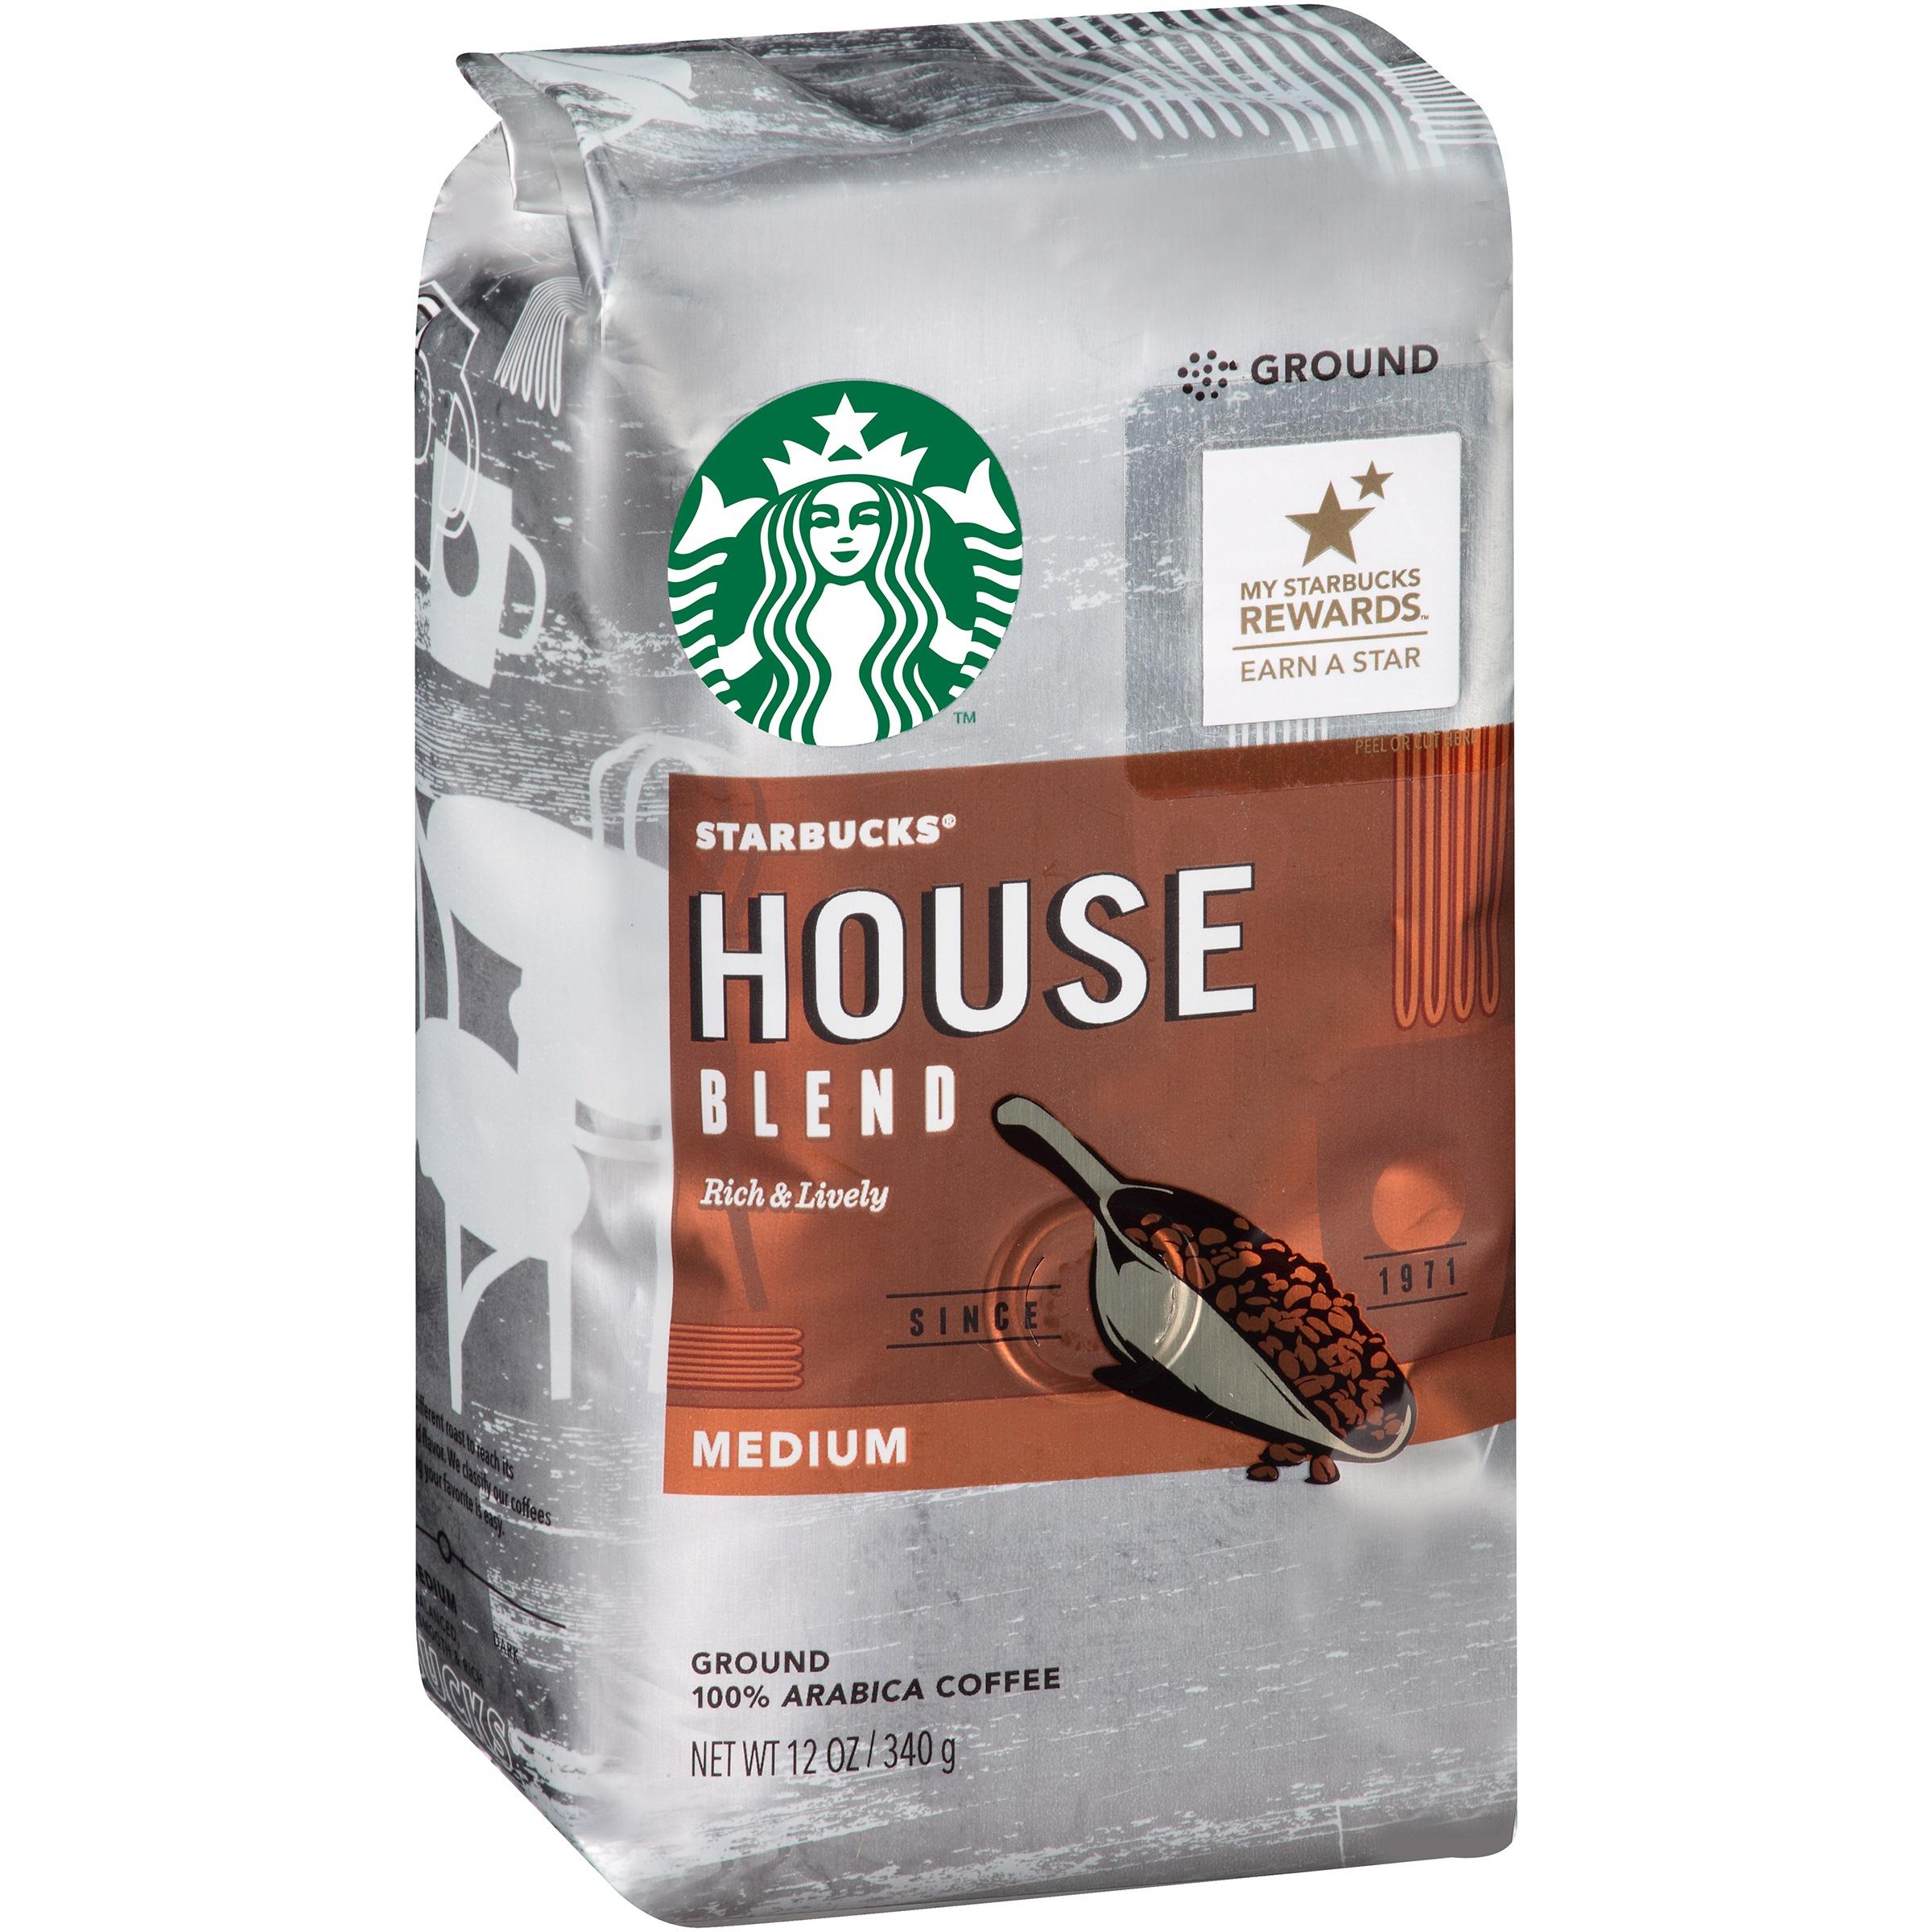 Starbucks House Blend Medium Ground 100% Arabica Coffee, 12 oz